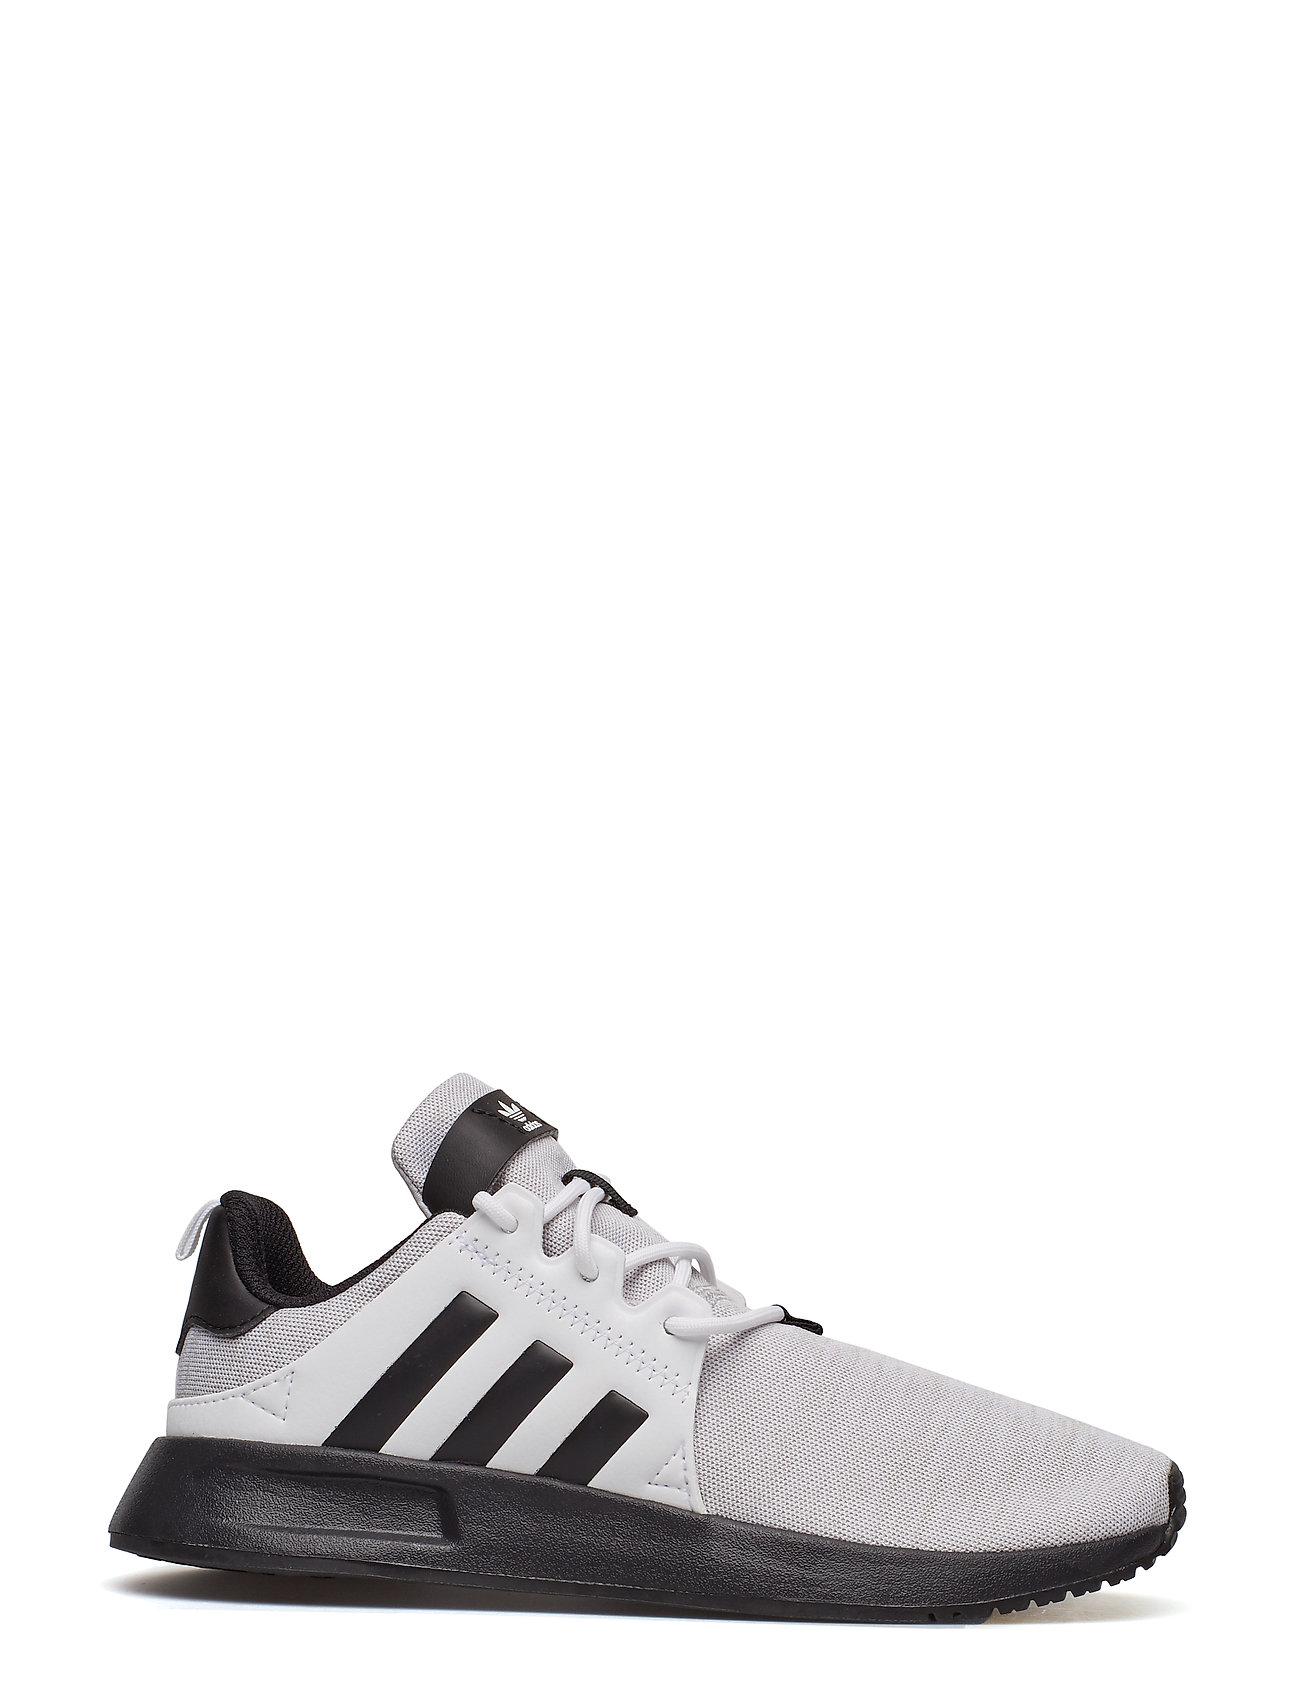 Billig adidas Originals Menn Sko Sneakers X_PLR Varm salg